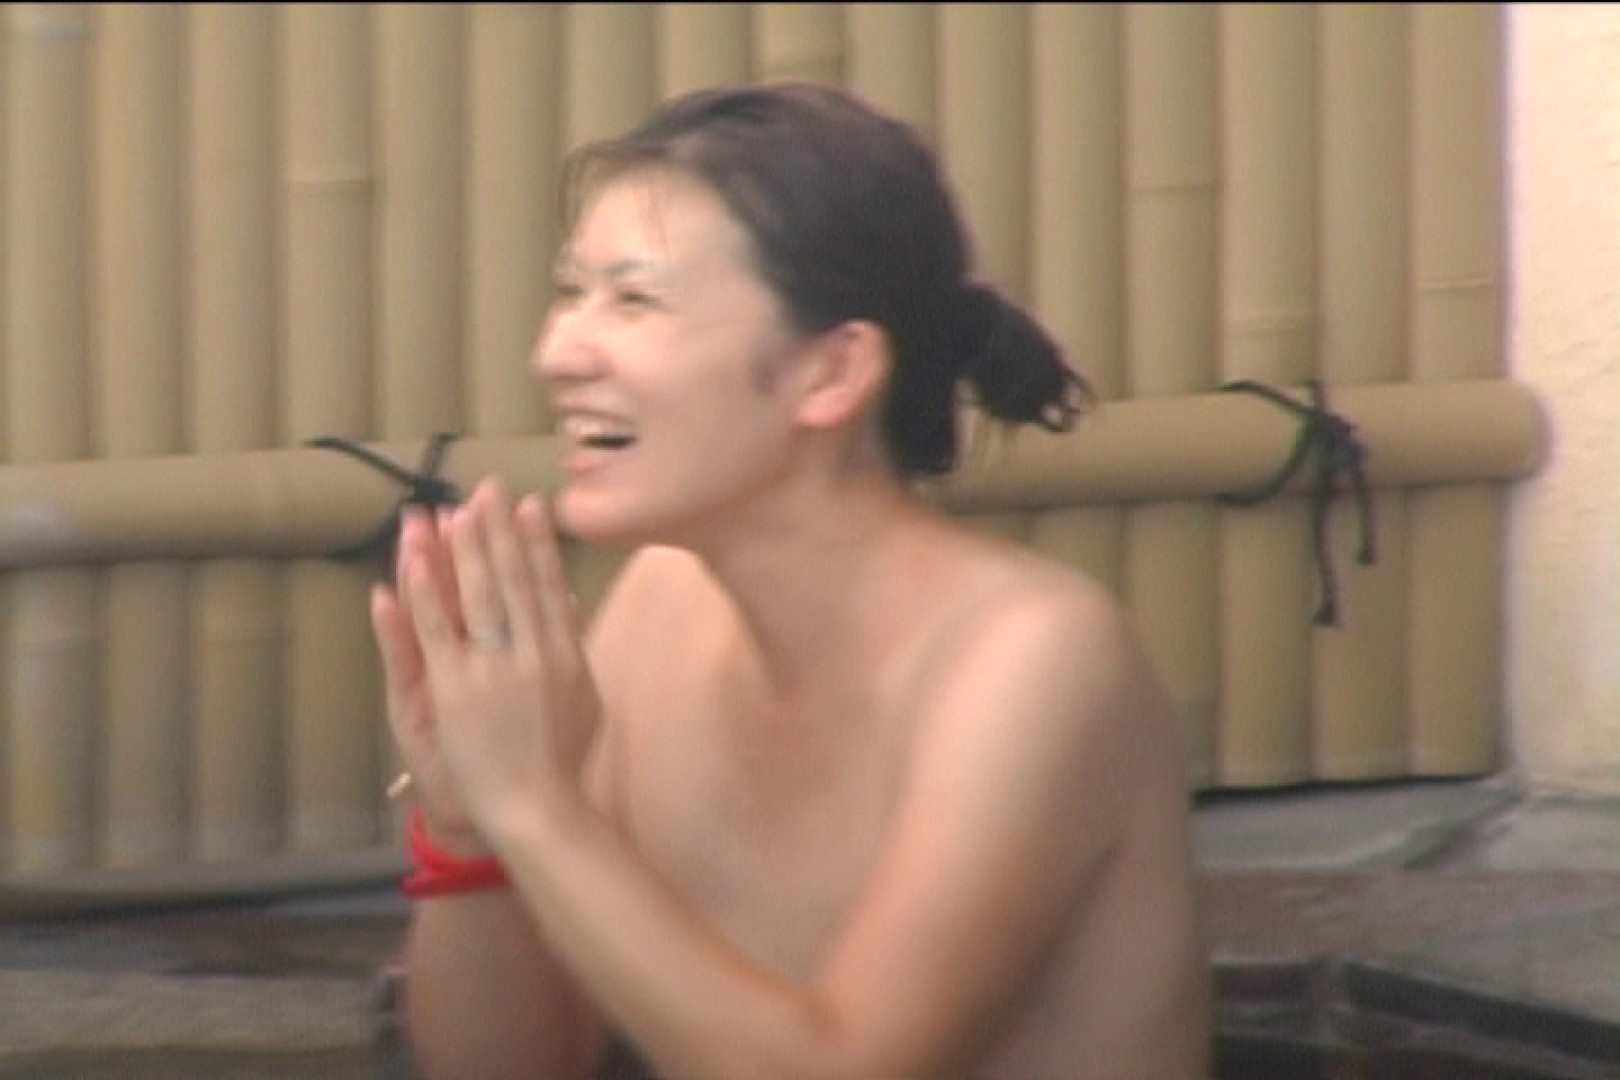 Aquaな露天風呂Vol.532 盗撮 | HなOL  65pic 3